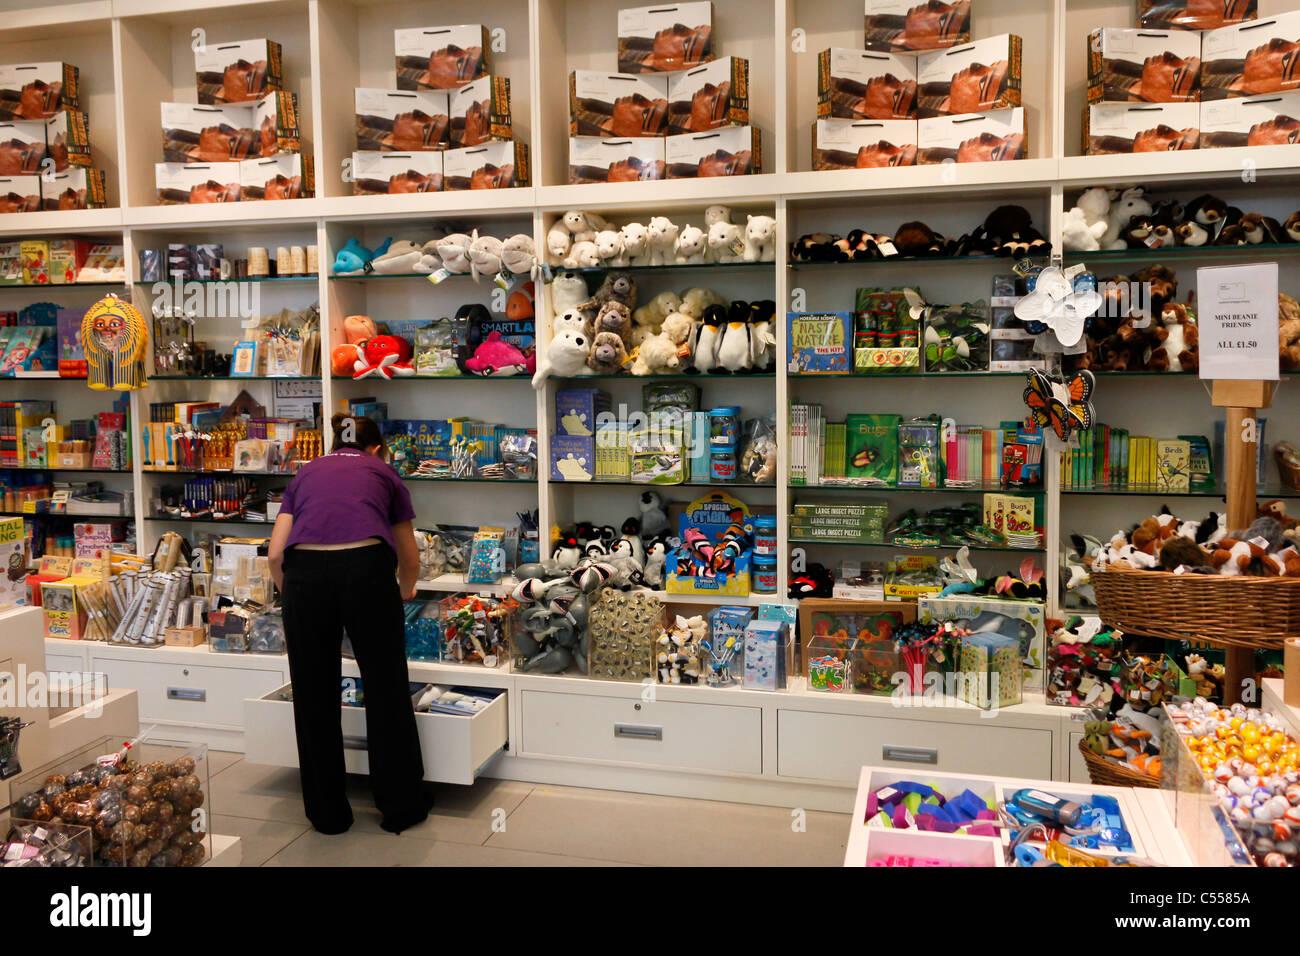 shop of the Ulster Museum, Belfast, Northern Ireland, UK - Stock Image